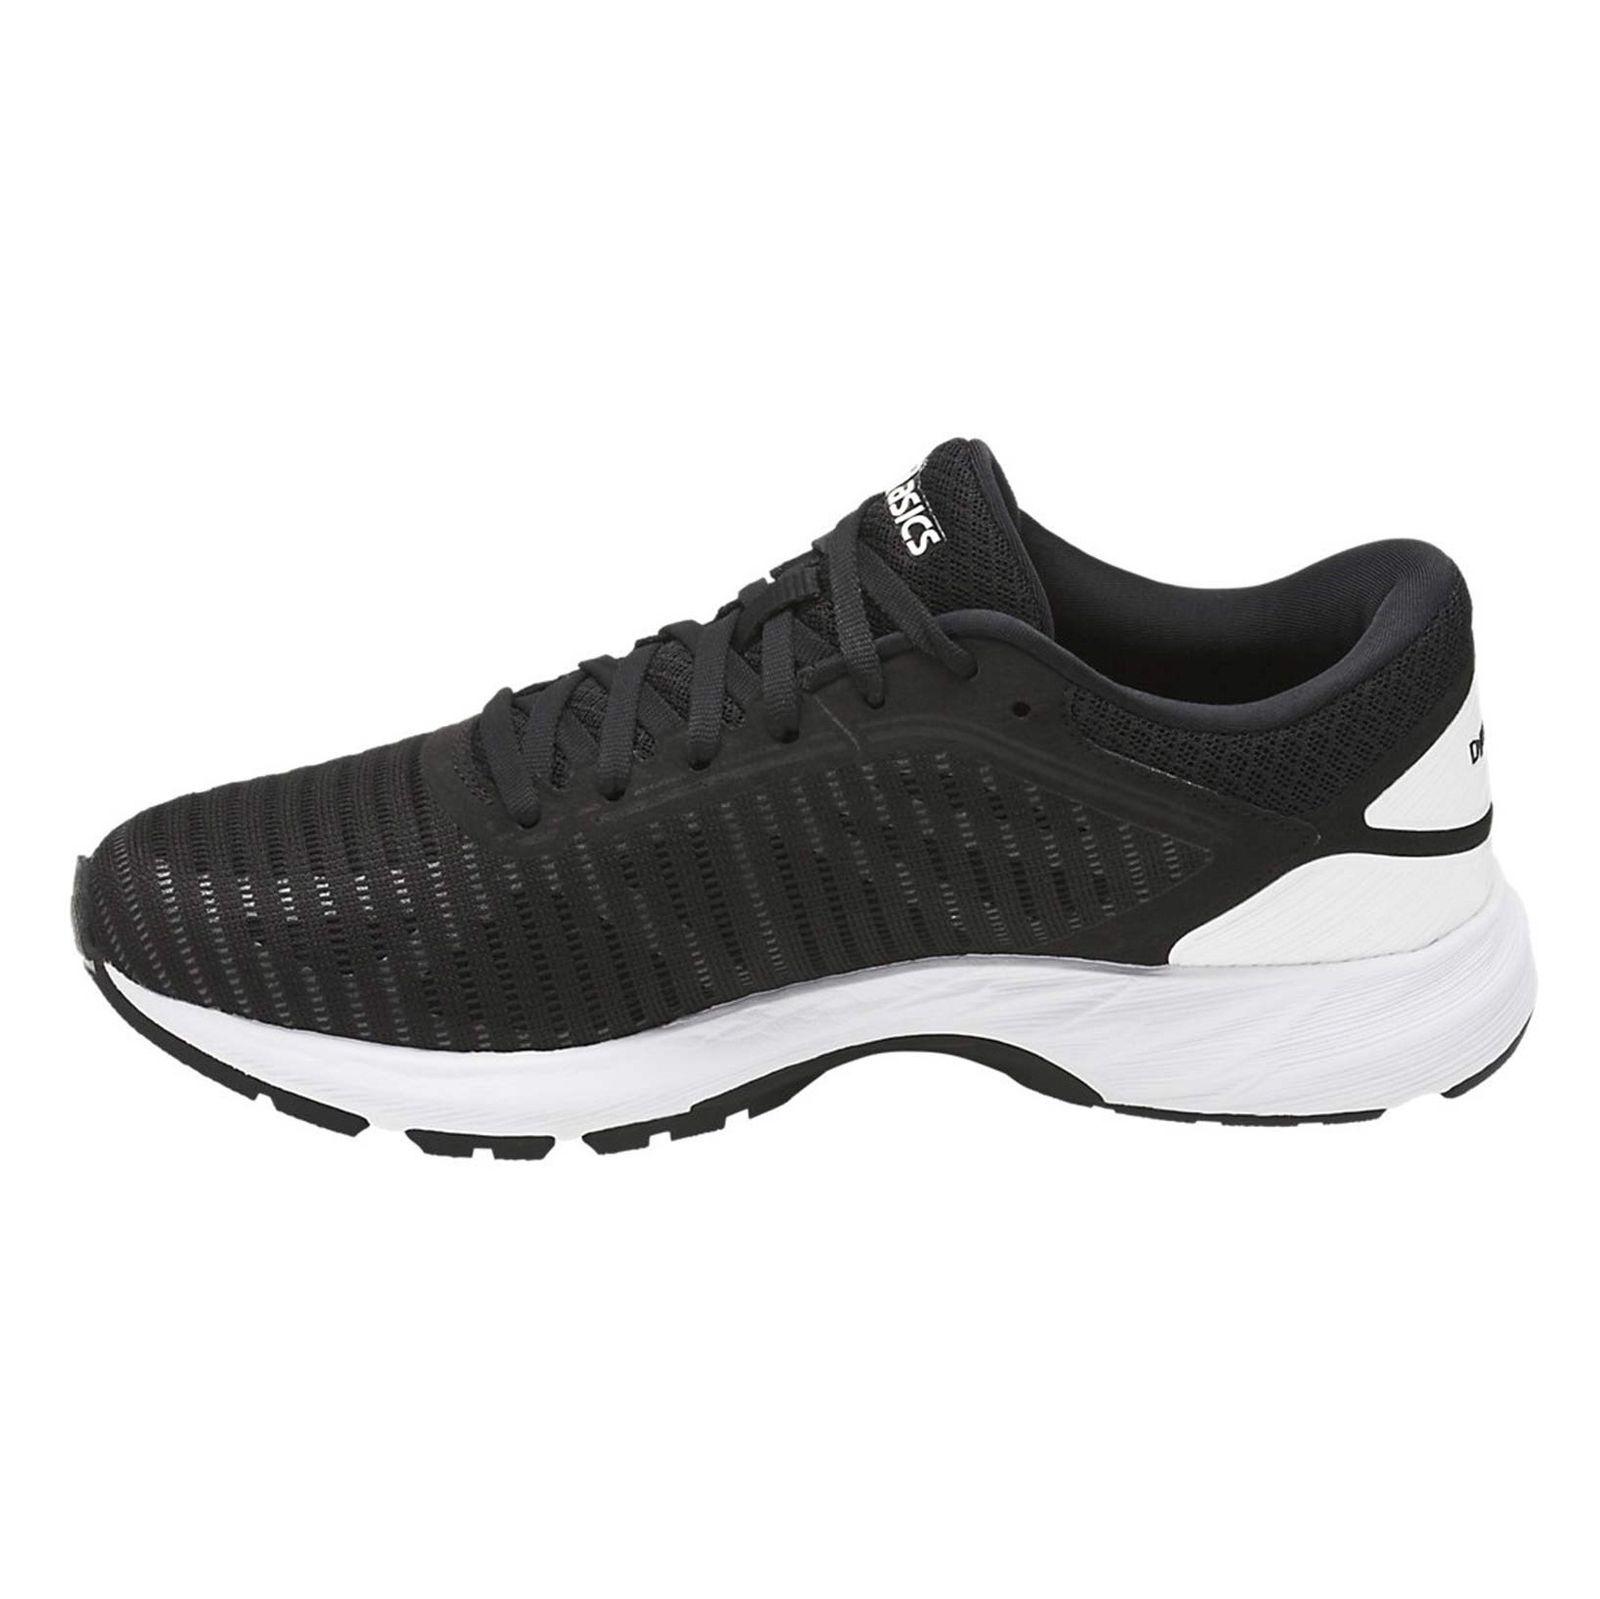 کفش دویدن بندی زنانه DynaFlyte 2 -  - مشکی - 6